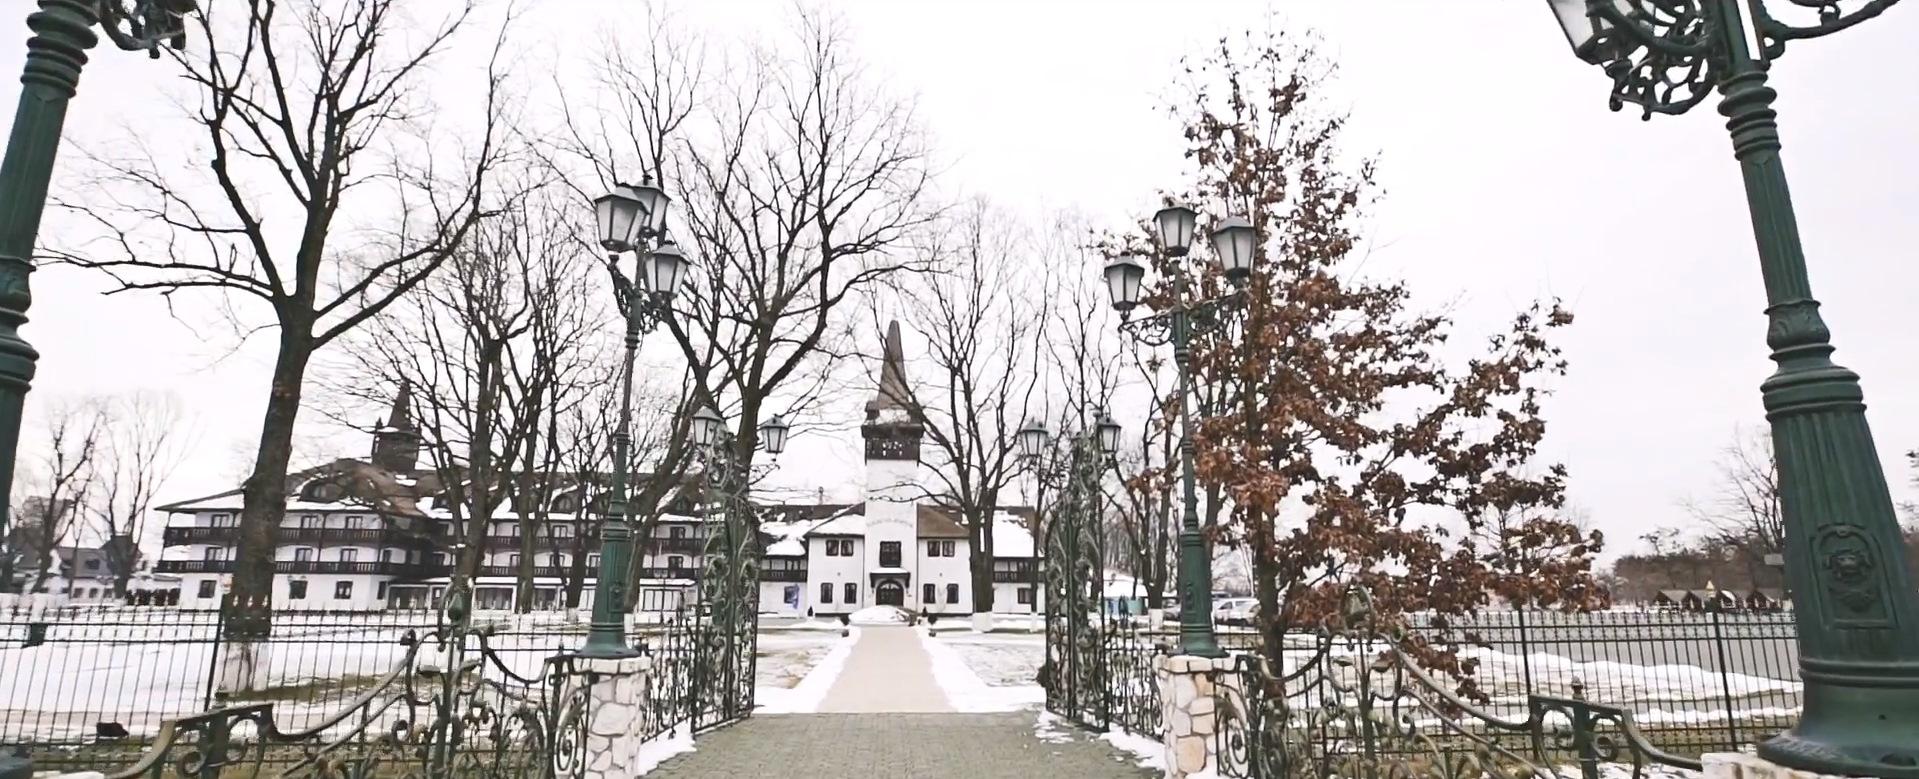 "Visit ""Kosino's thermal waters"" in winter!"